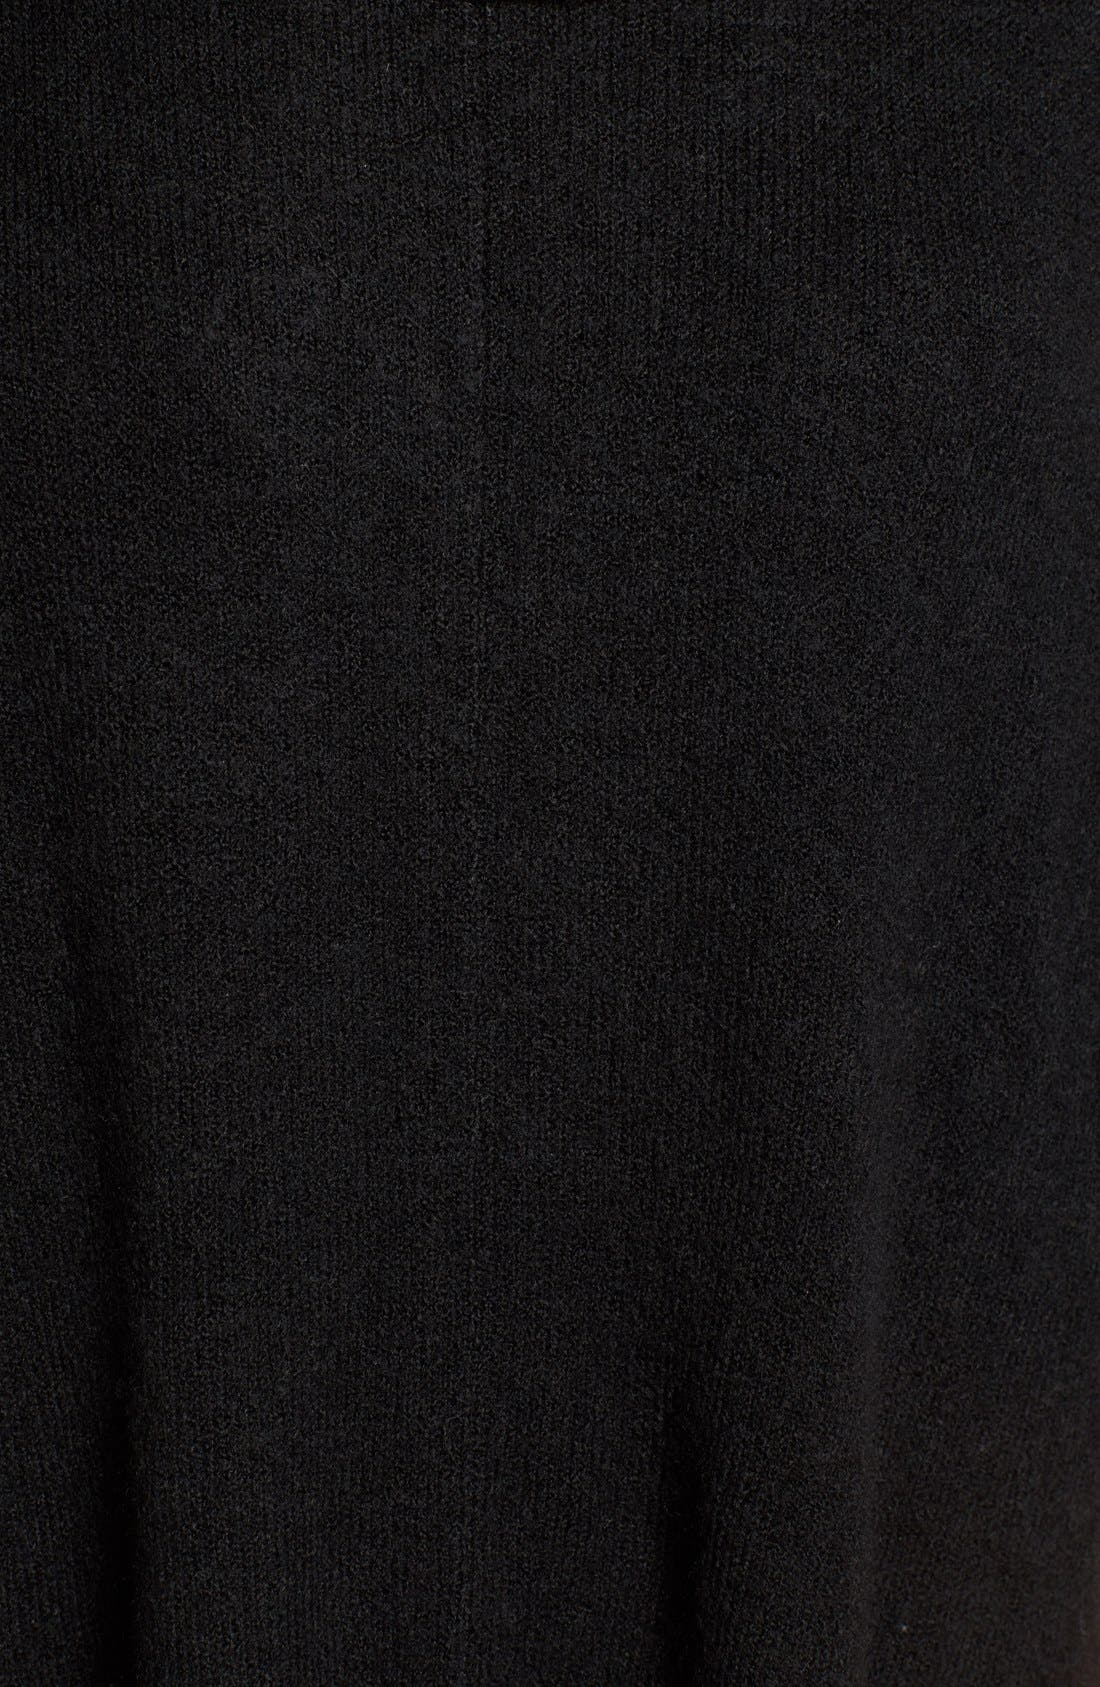 Cowl Neck Sweater Poncho,                             Alternate thumbnail 5, color,                             Black